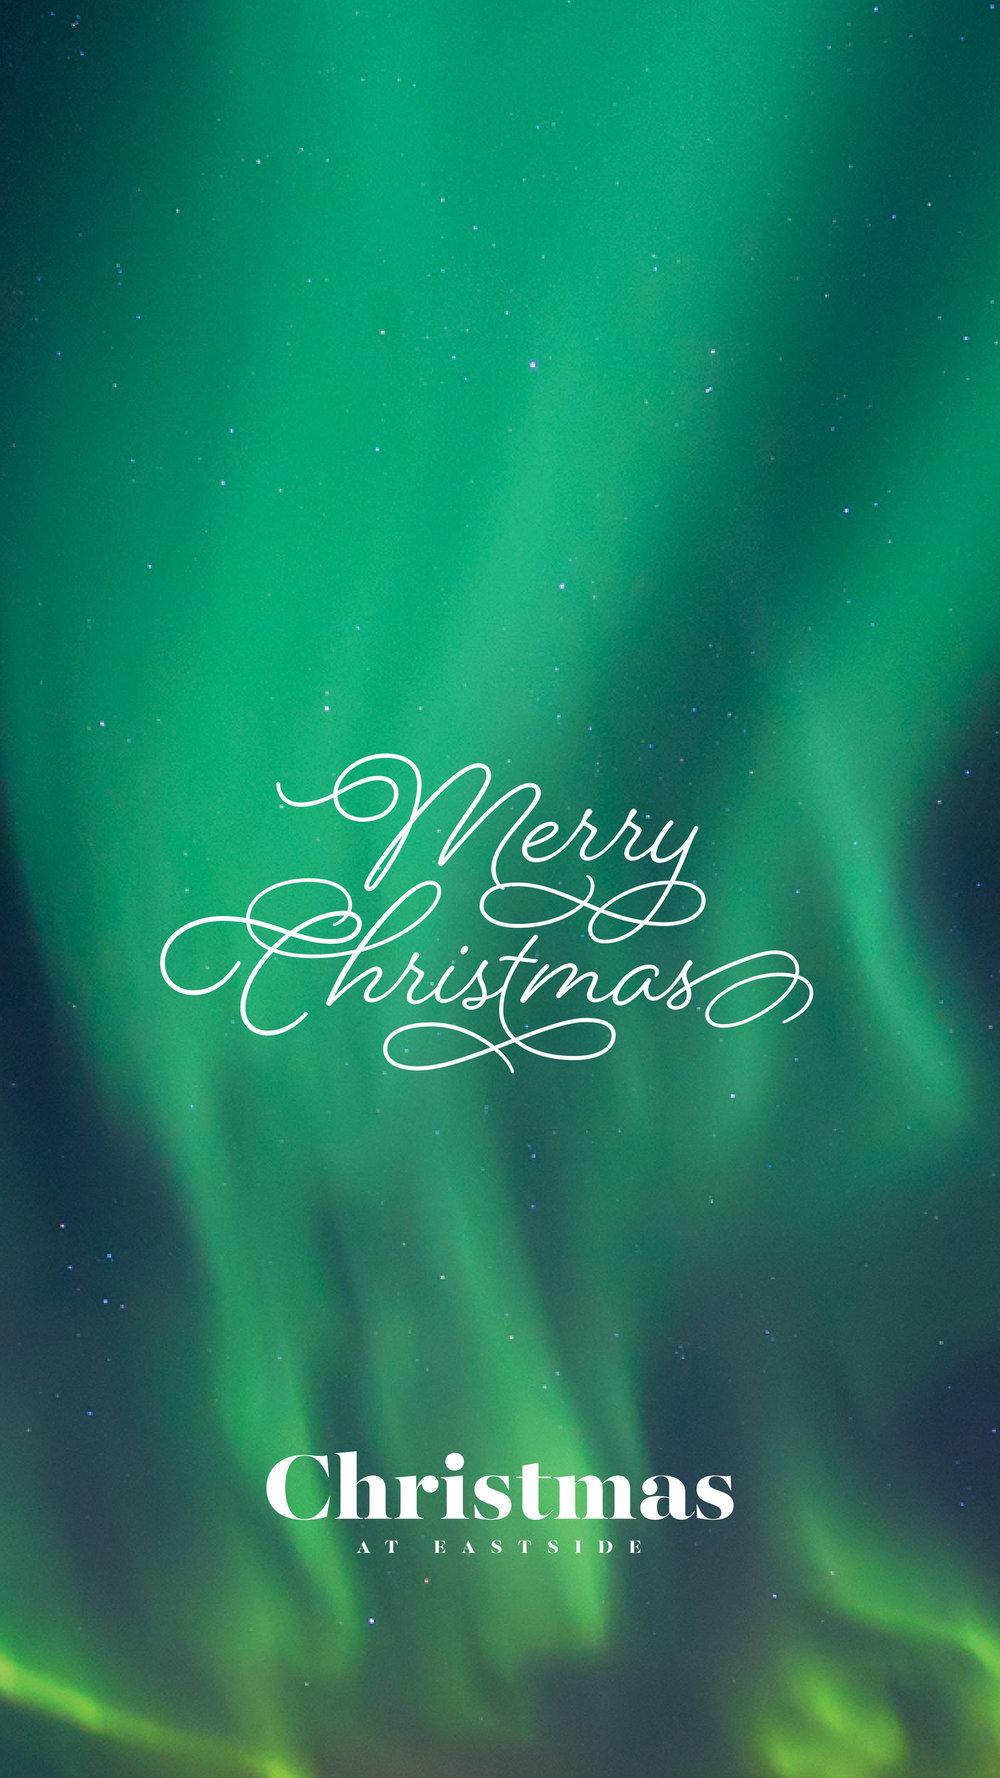 ChristmasAtEastsideInstaStory3.jpg